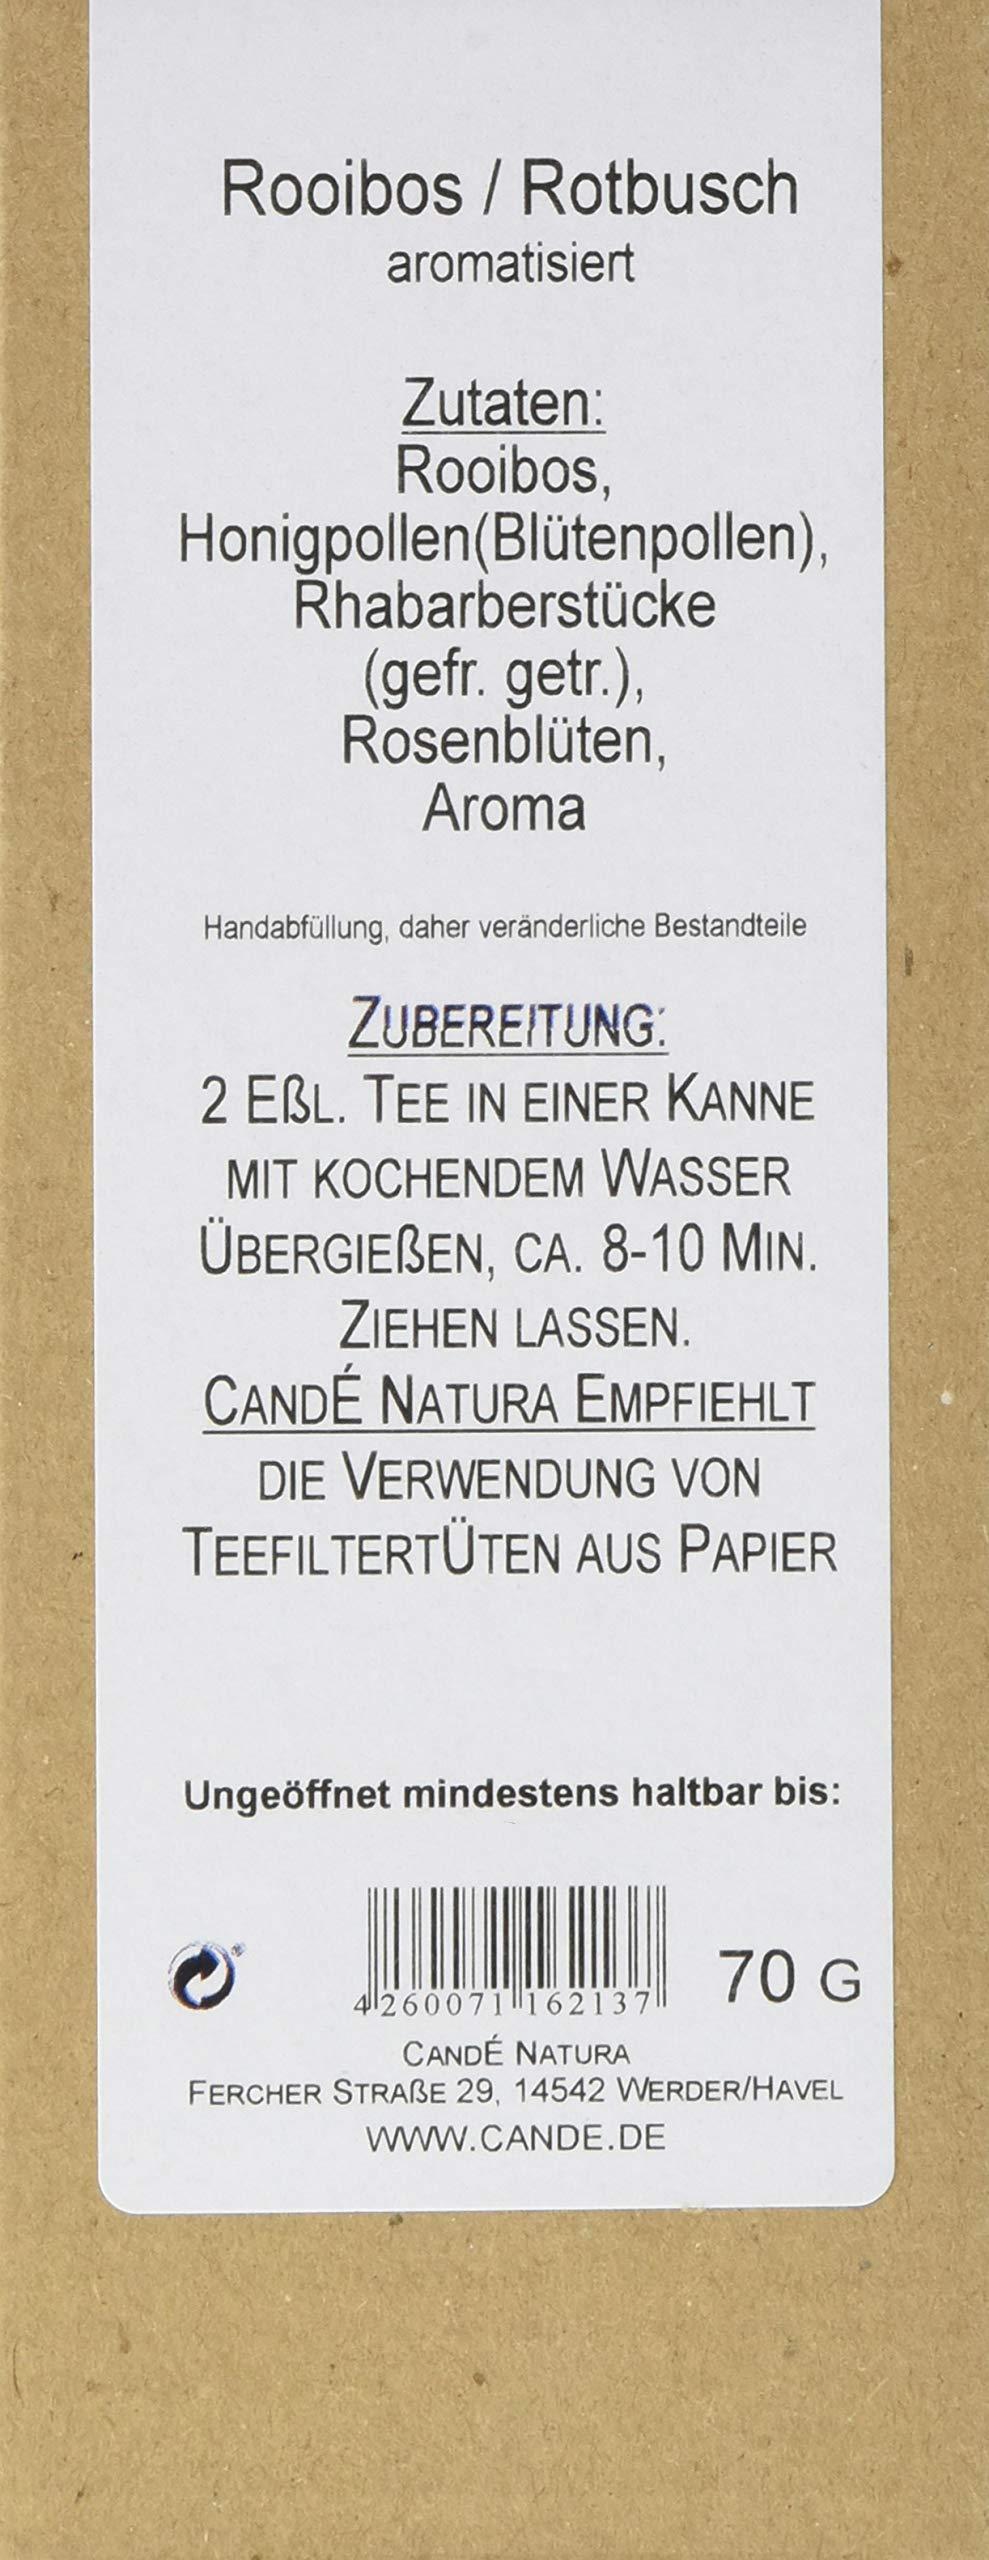 Cand-Natura-Teemanufaktur-Rhabarber-Sahne-Vanille-Rooibosteemischung-aromatisiert-5er-Pack-5-x-70-g